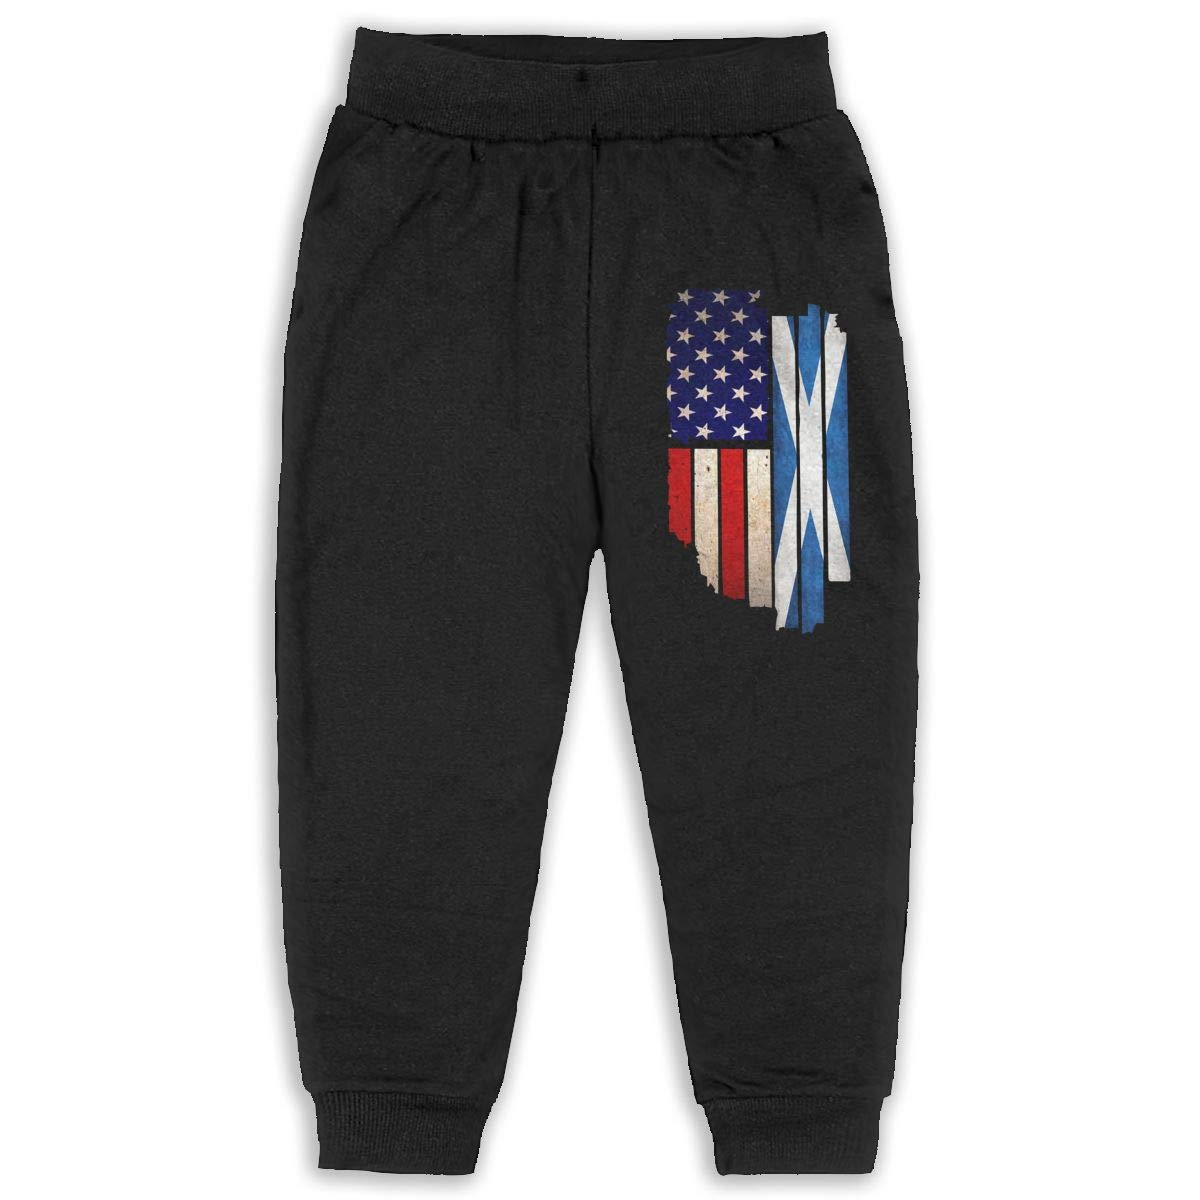 Kids /& Toddler Pants Soft Cozy Baby Sweatpants Vintage USA Scotland Flag Fleece Pants Sports Pants